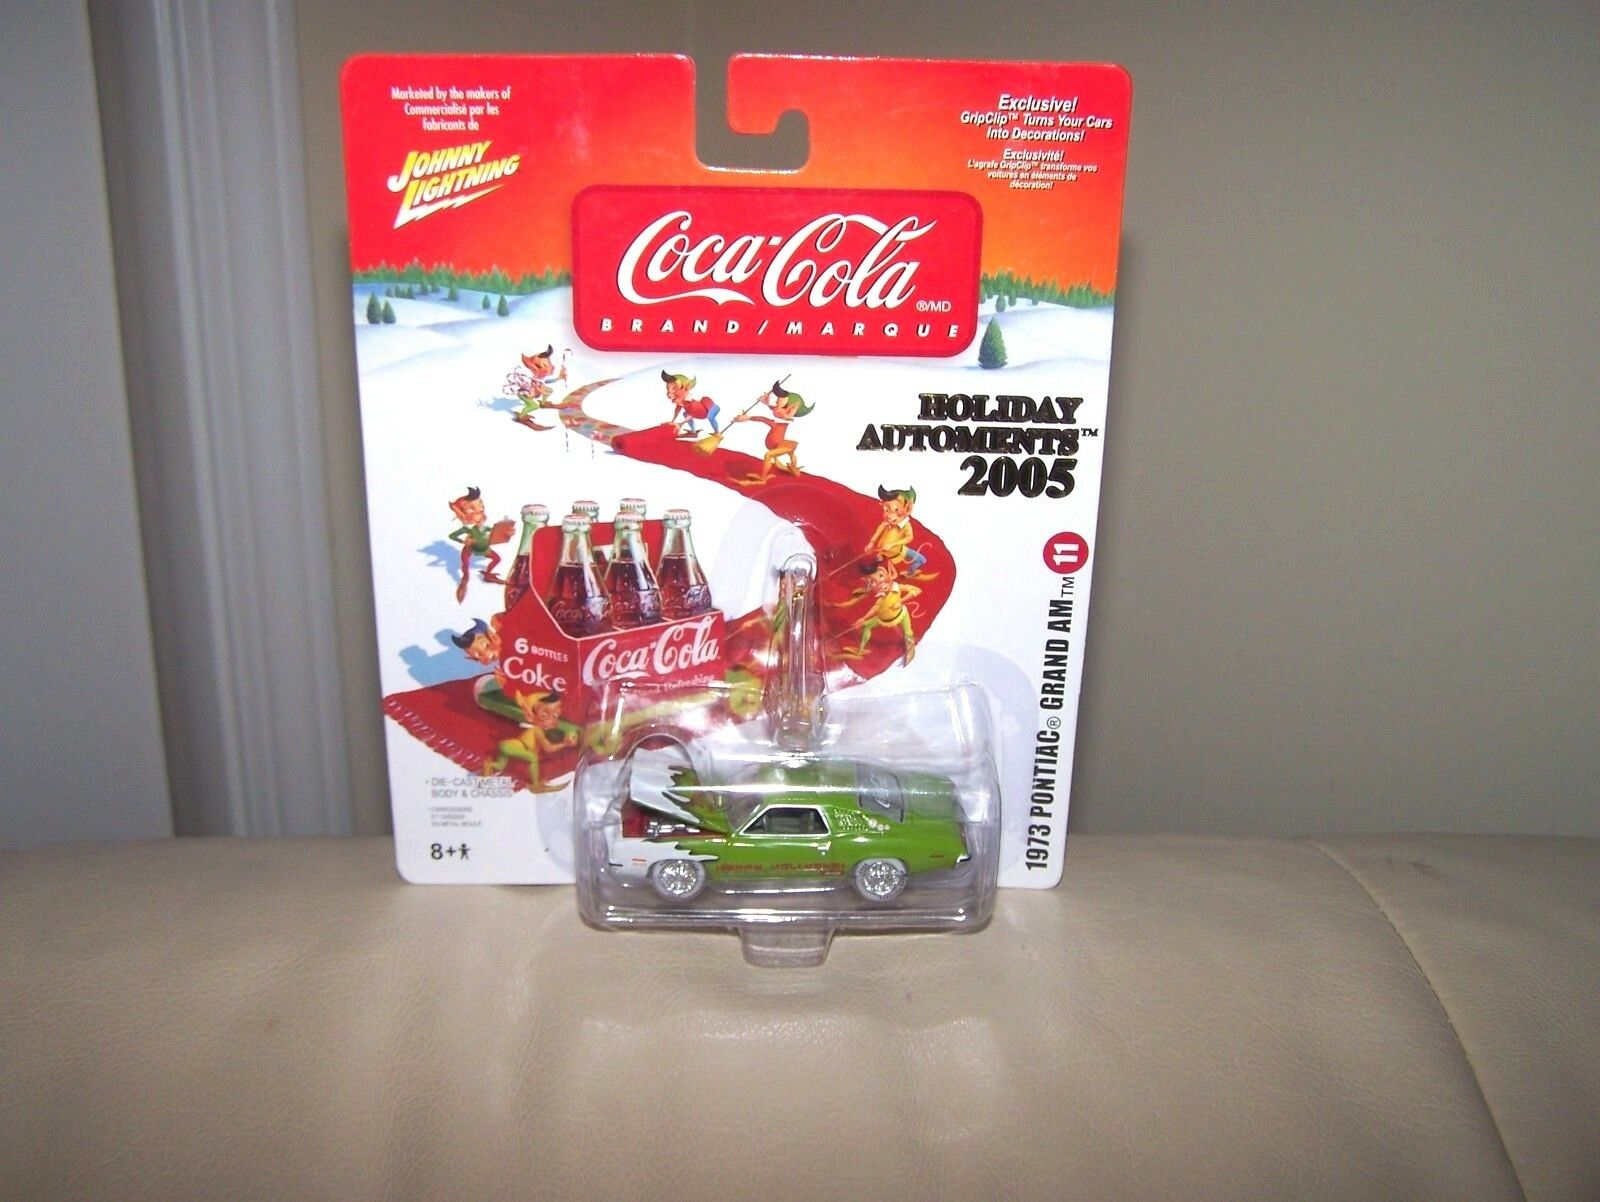 2005 JOHNNY blanc lumièreNING-Coca Cola -  11 -  1973 Pontiac Grand AM-Comme neuf IN BOX  belle